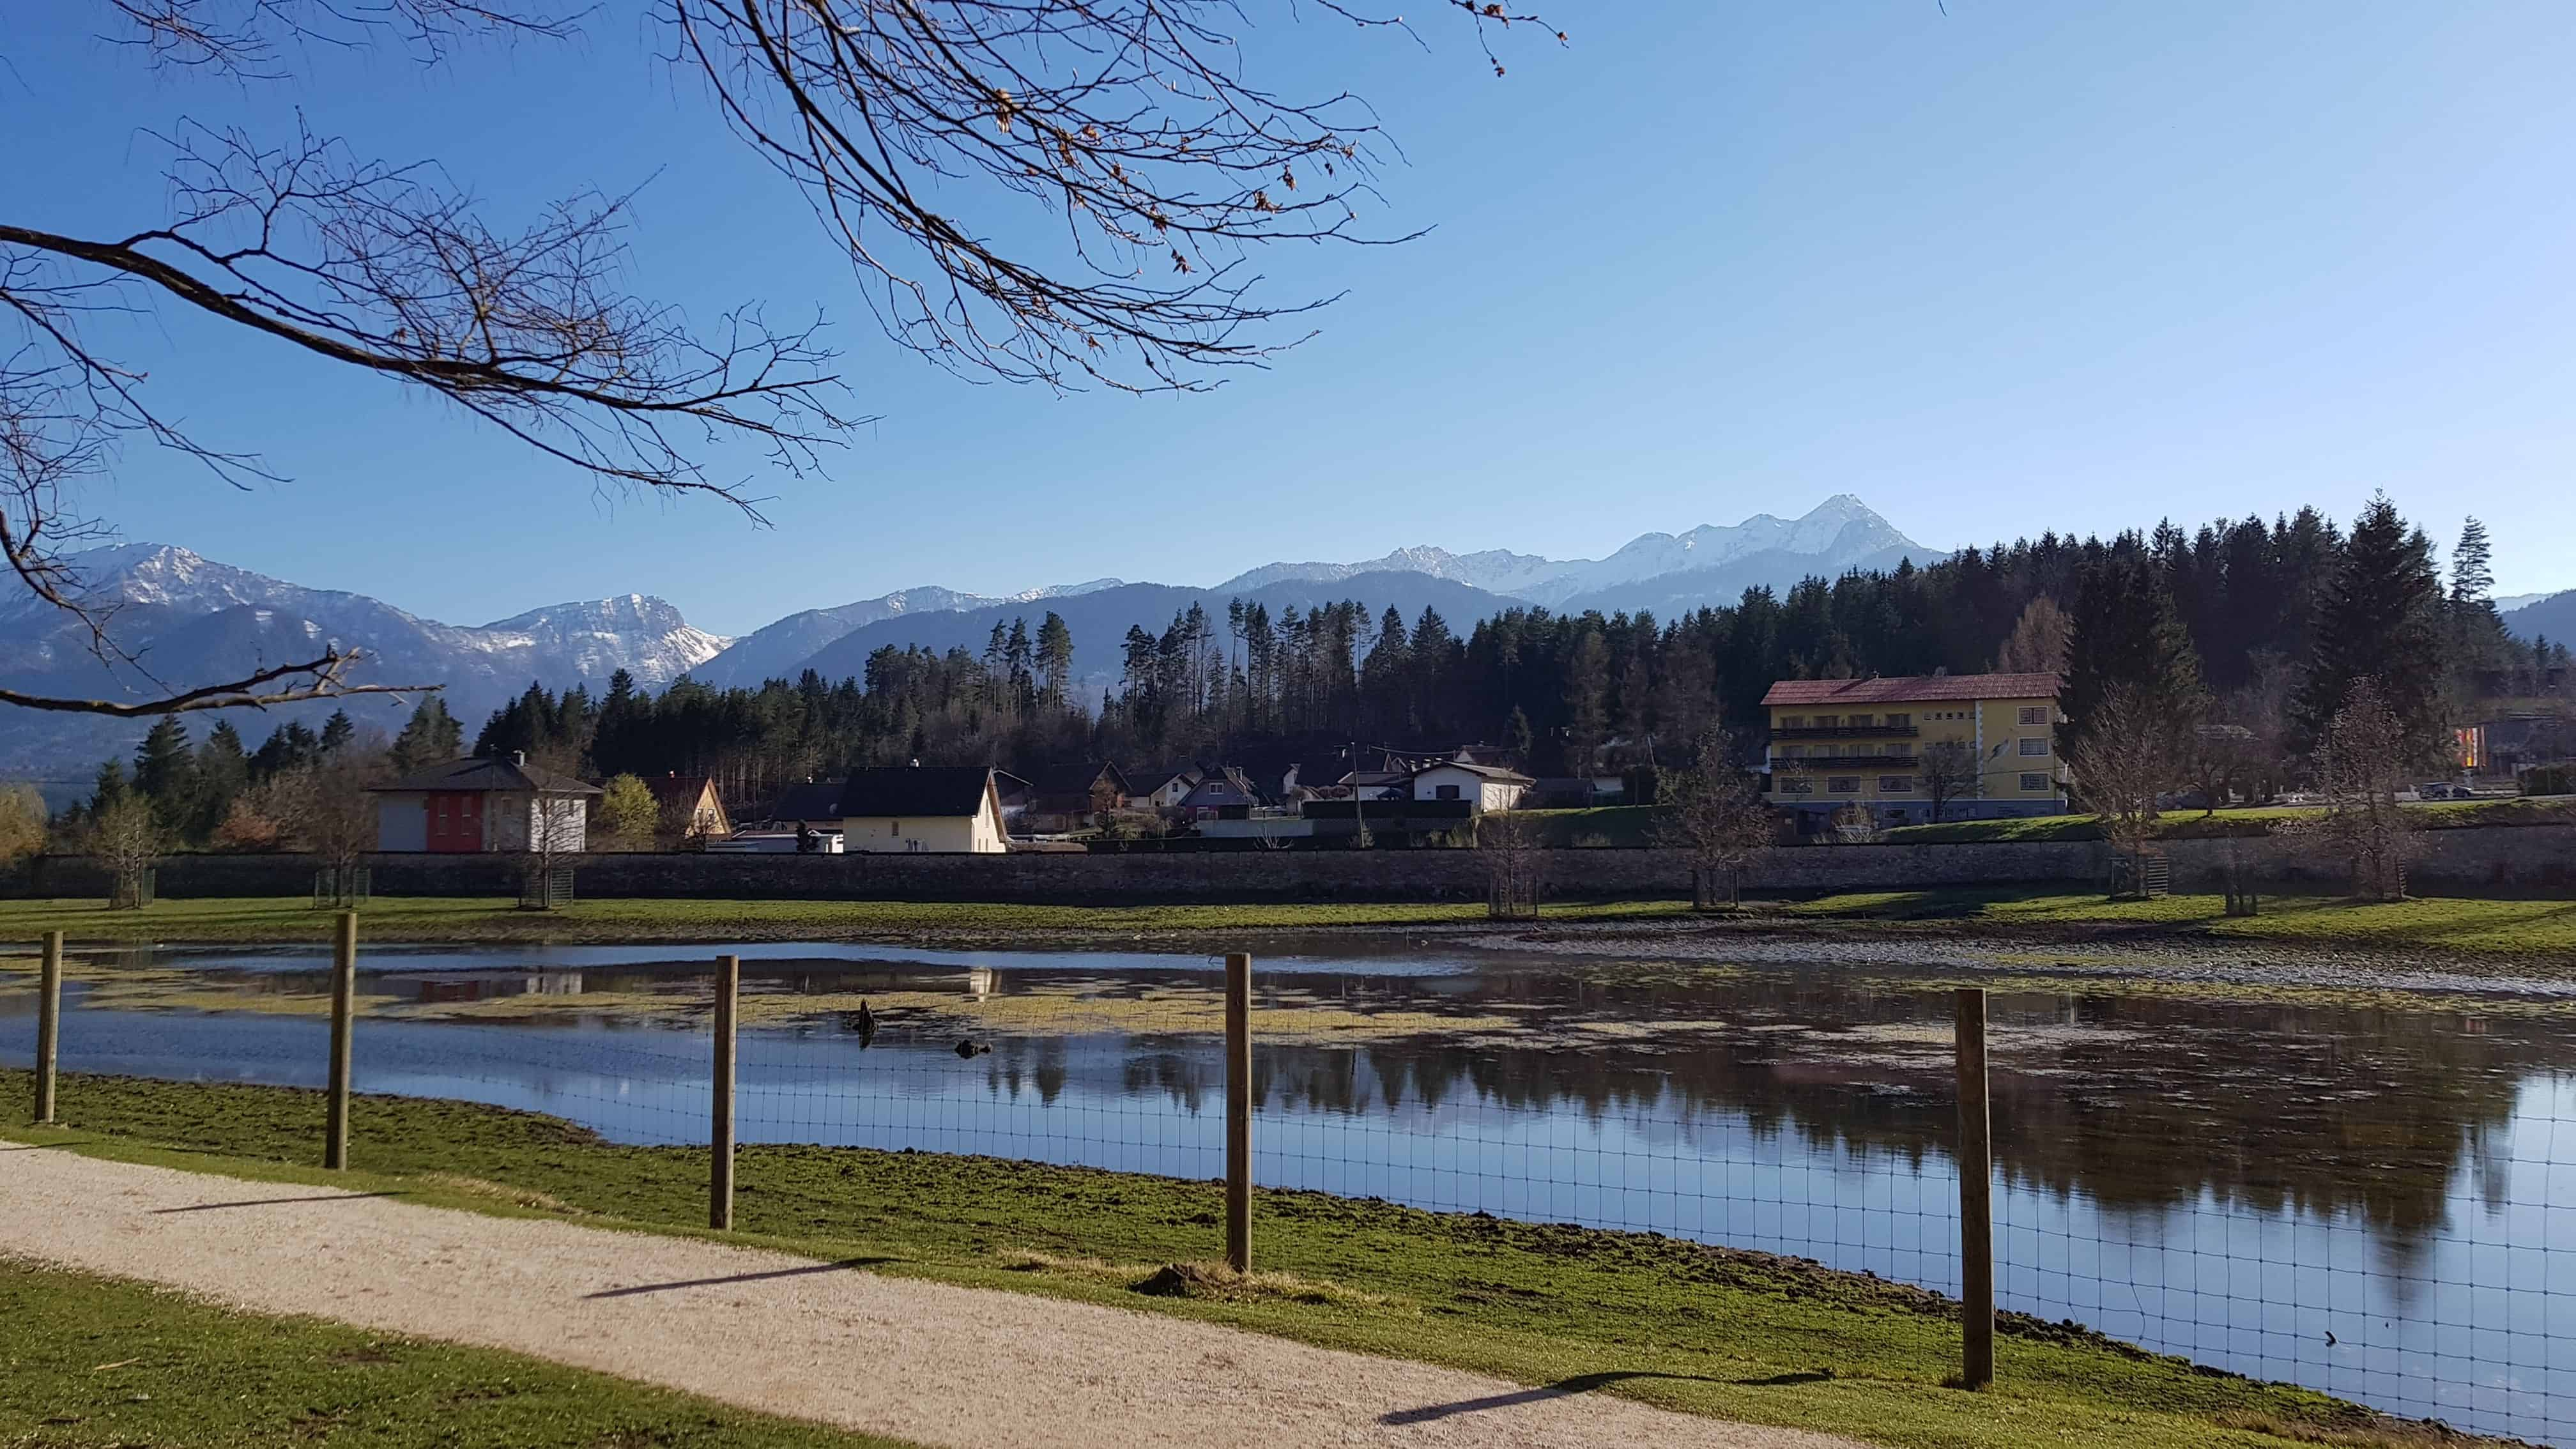 Bison-Gehege Tierpark Rosegg Blick auf Karawanken Kärnten